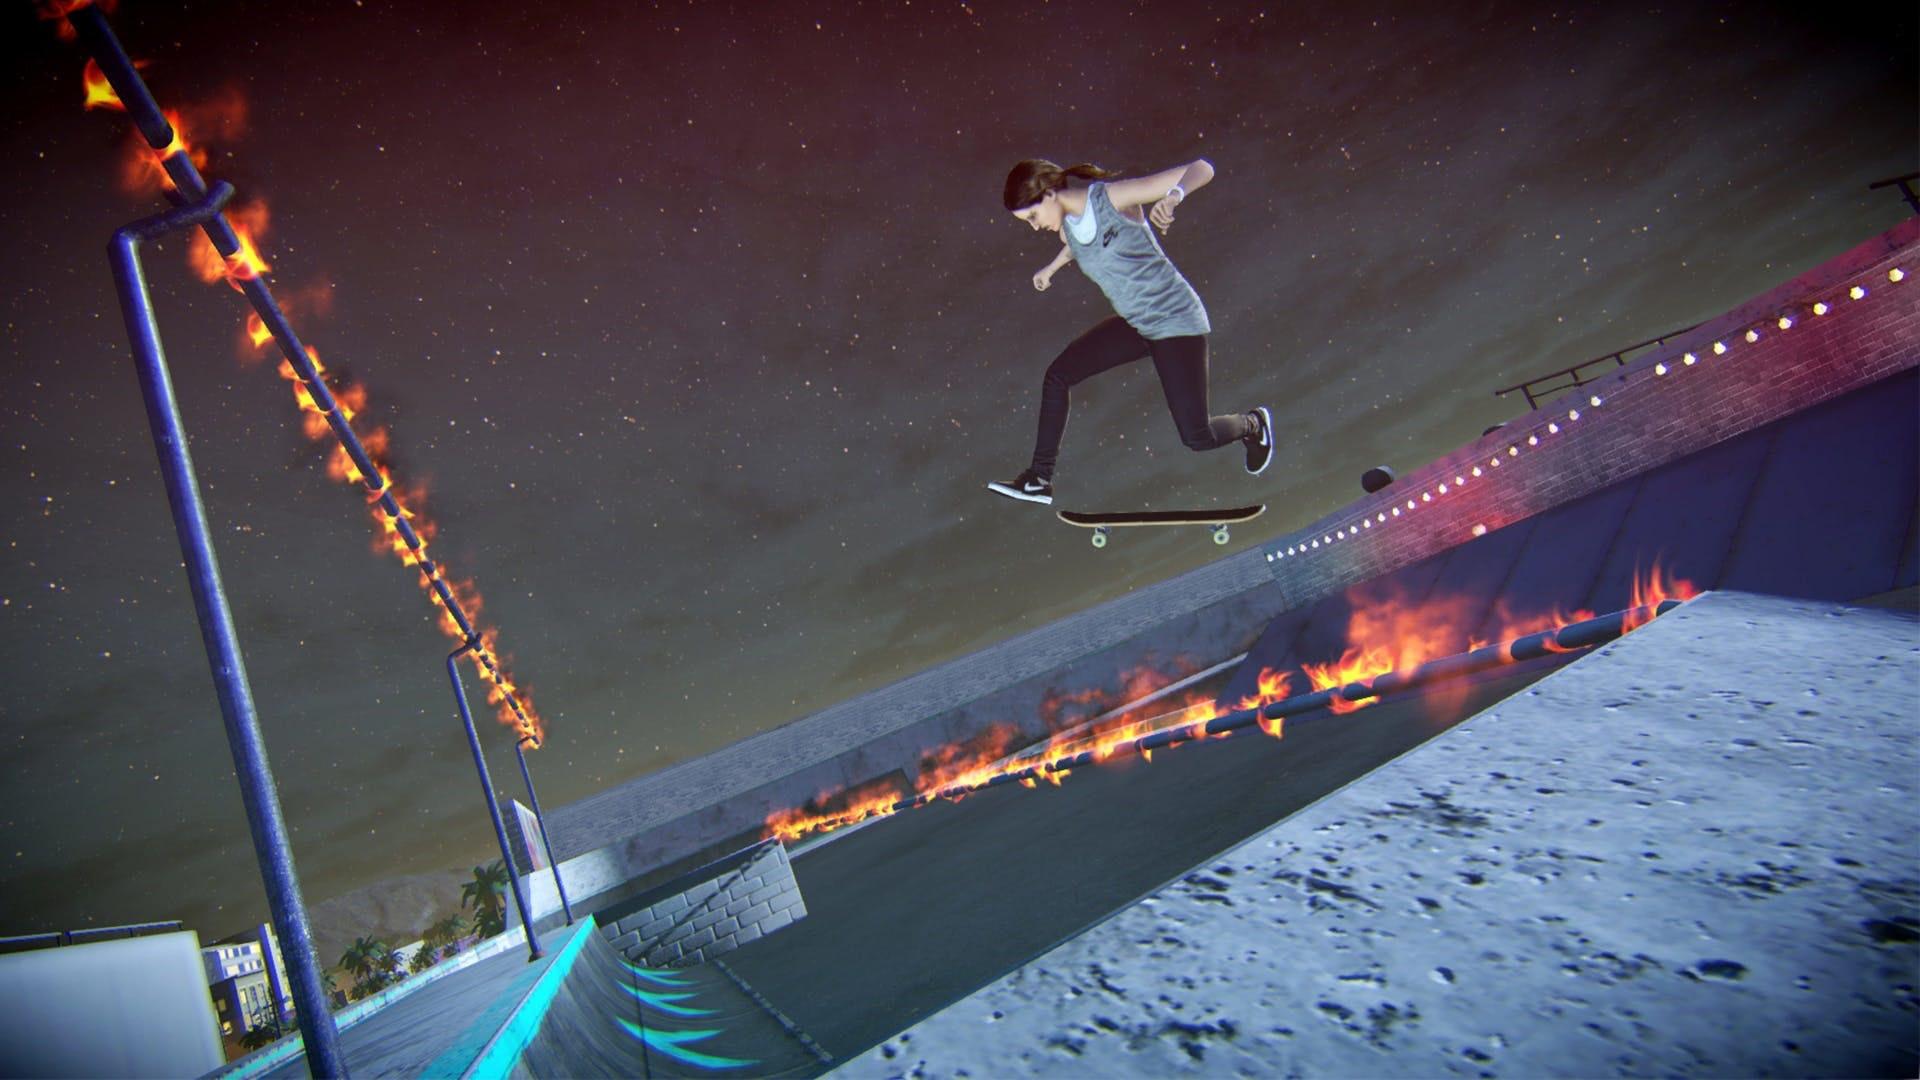 Tony Hawk's Pro Skater 5 Soundtrack